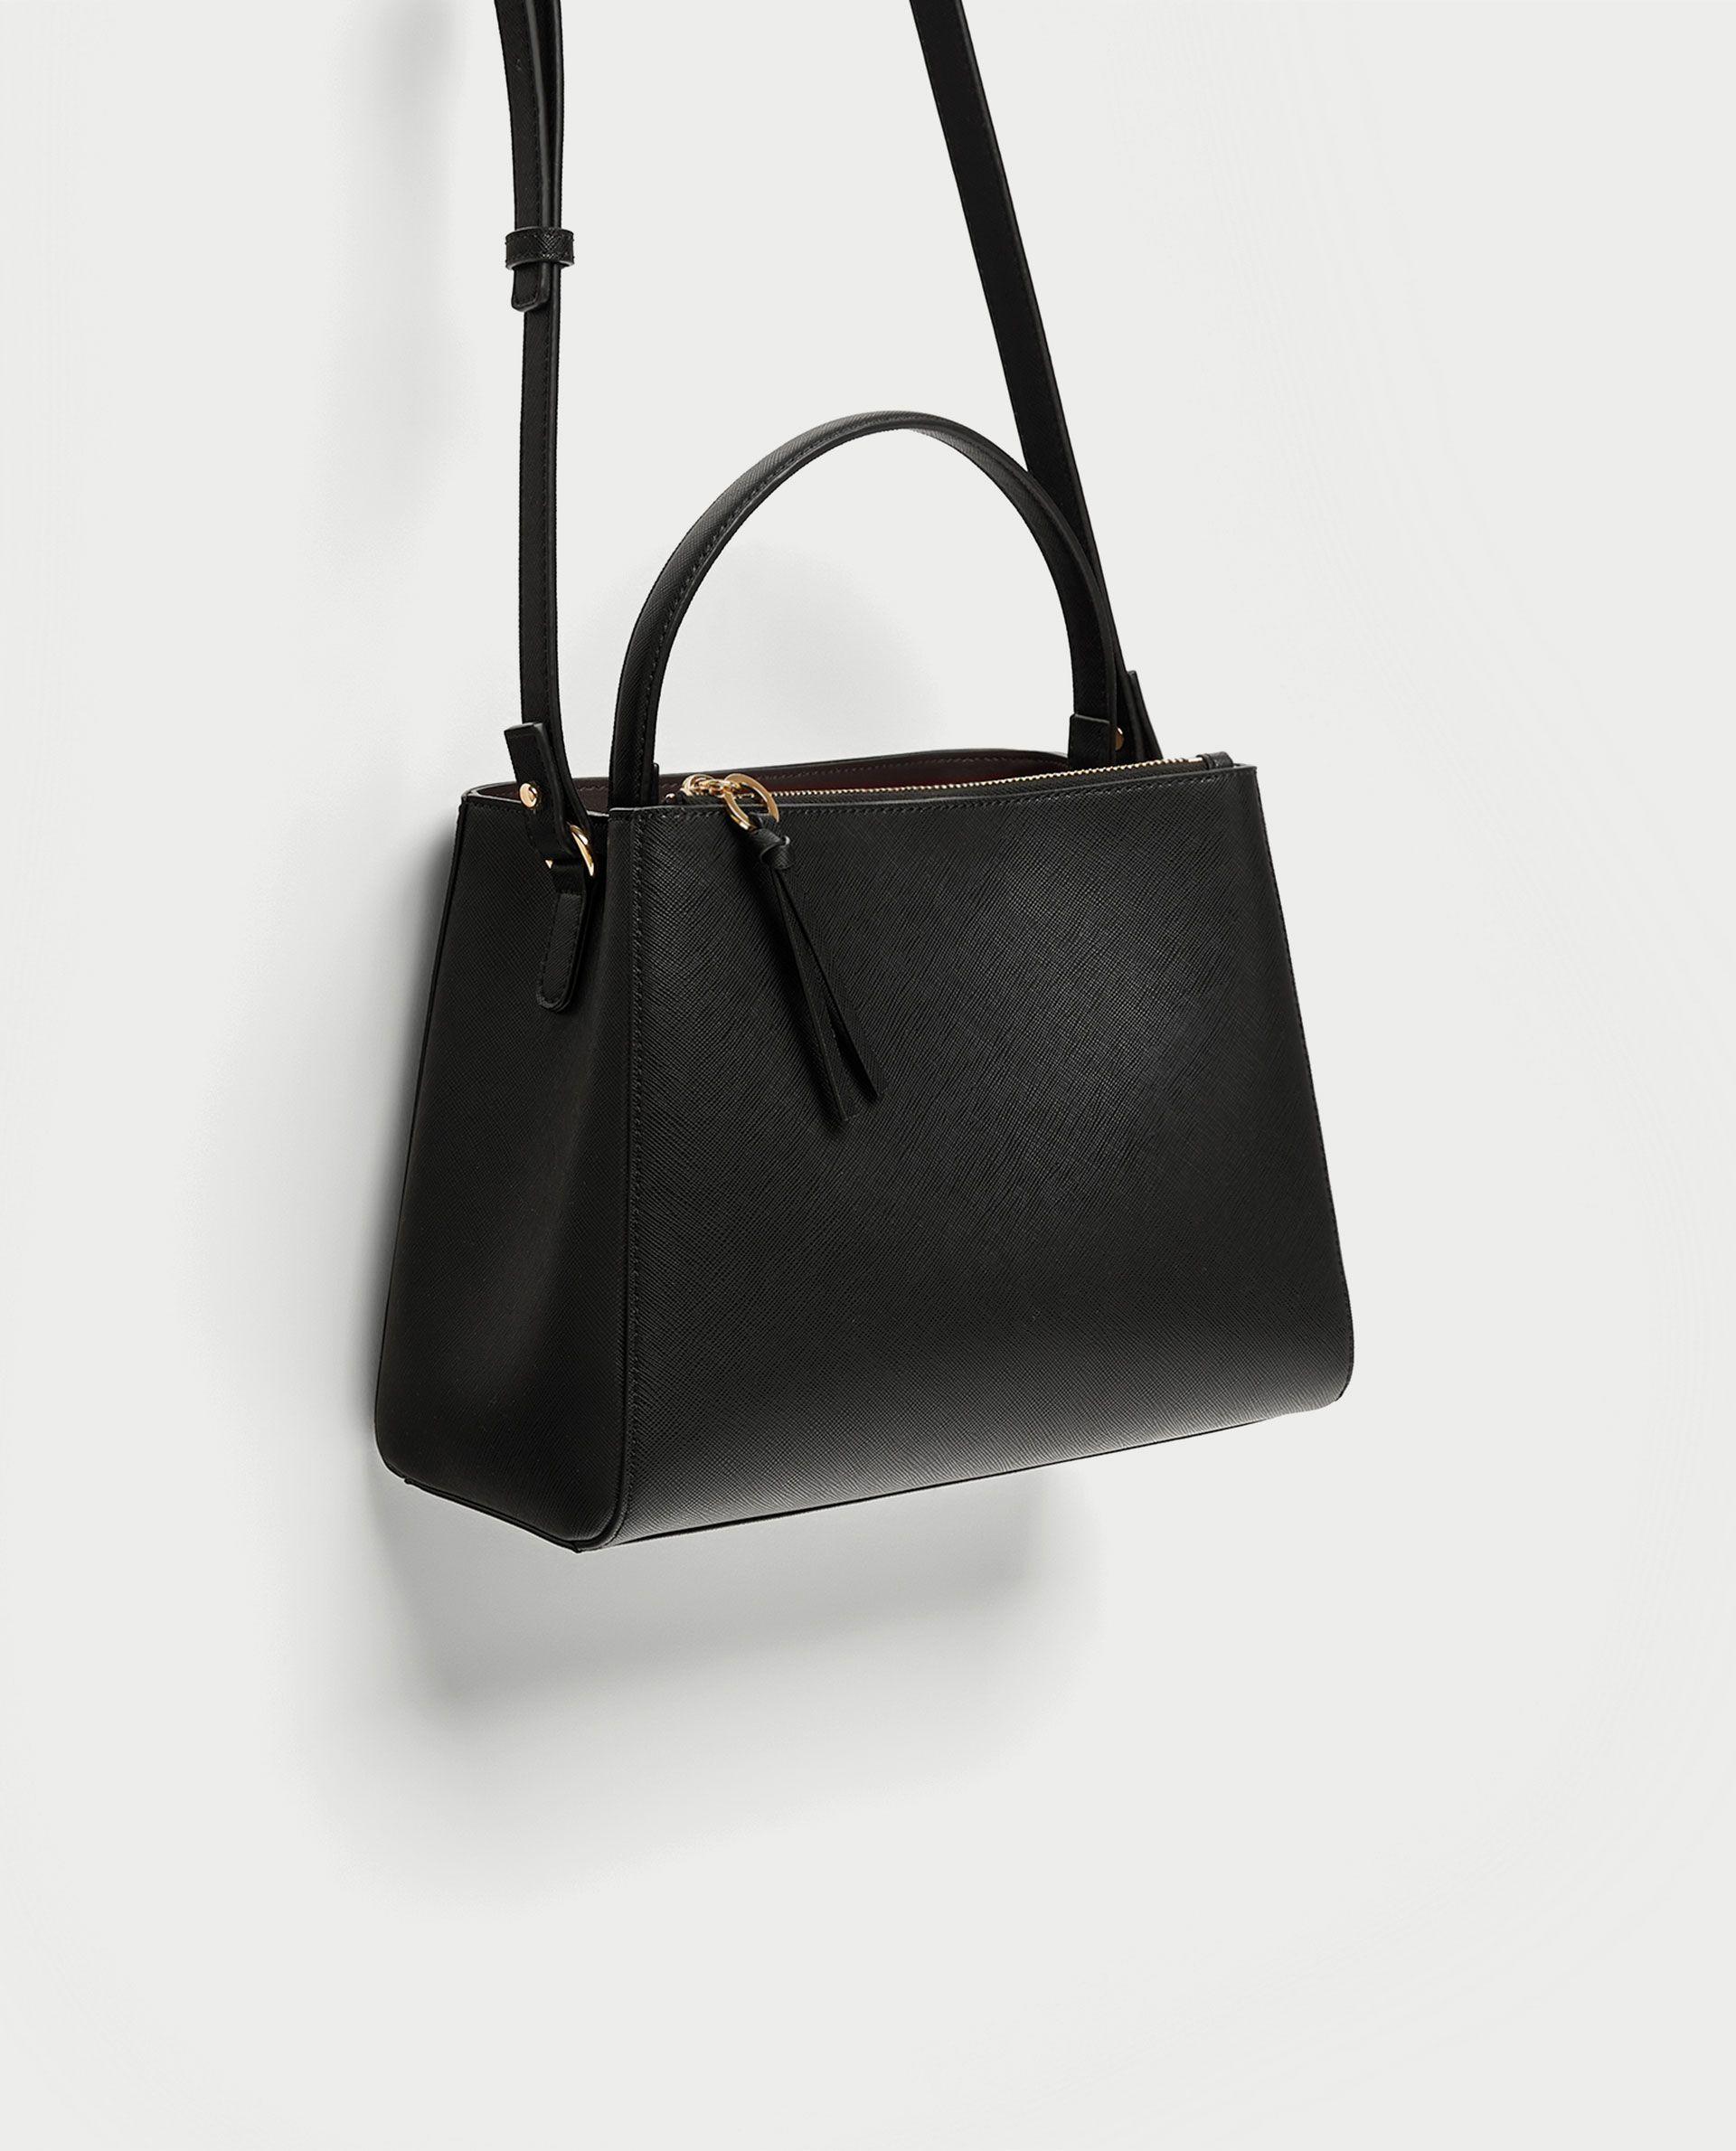 Shopping > sacoche noir femme zara, Up to 74% OFF